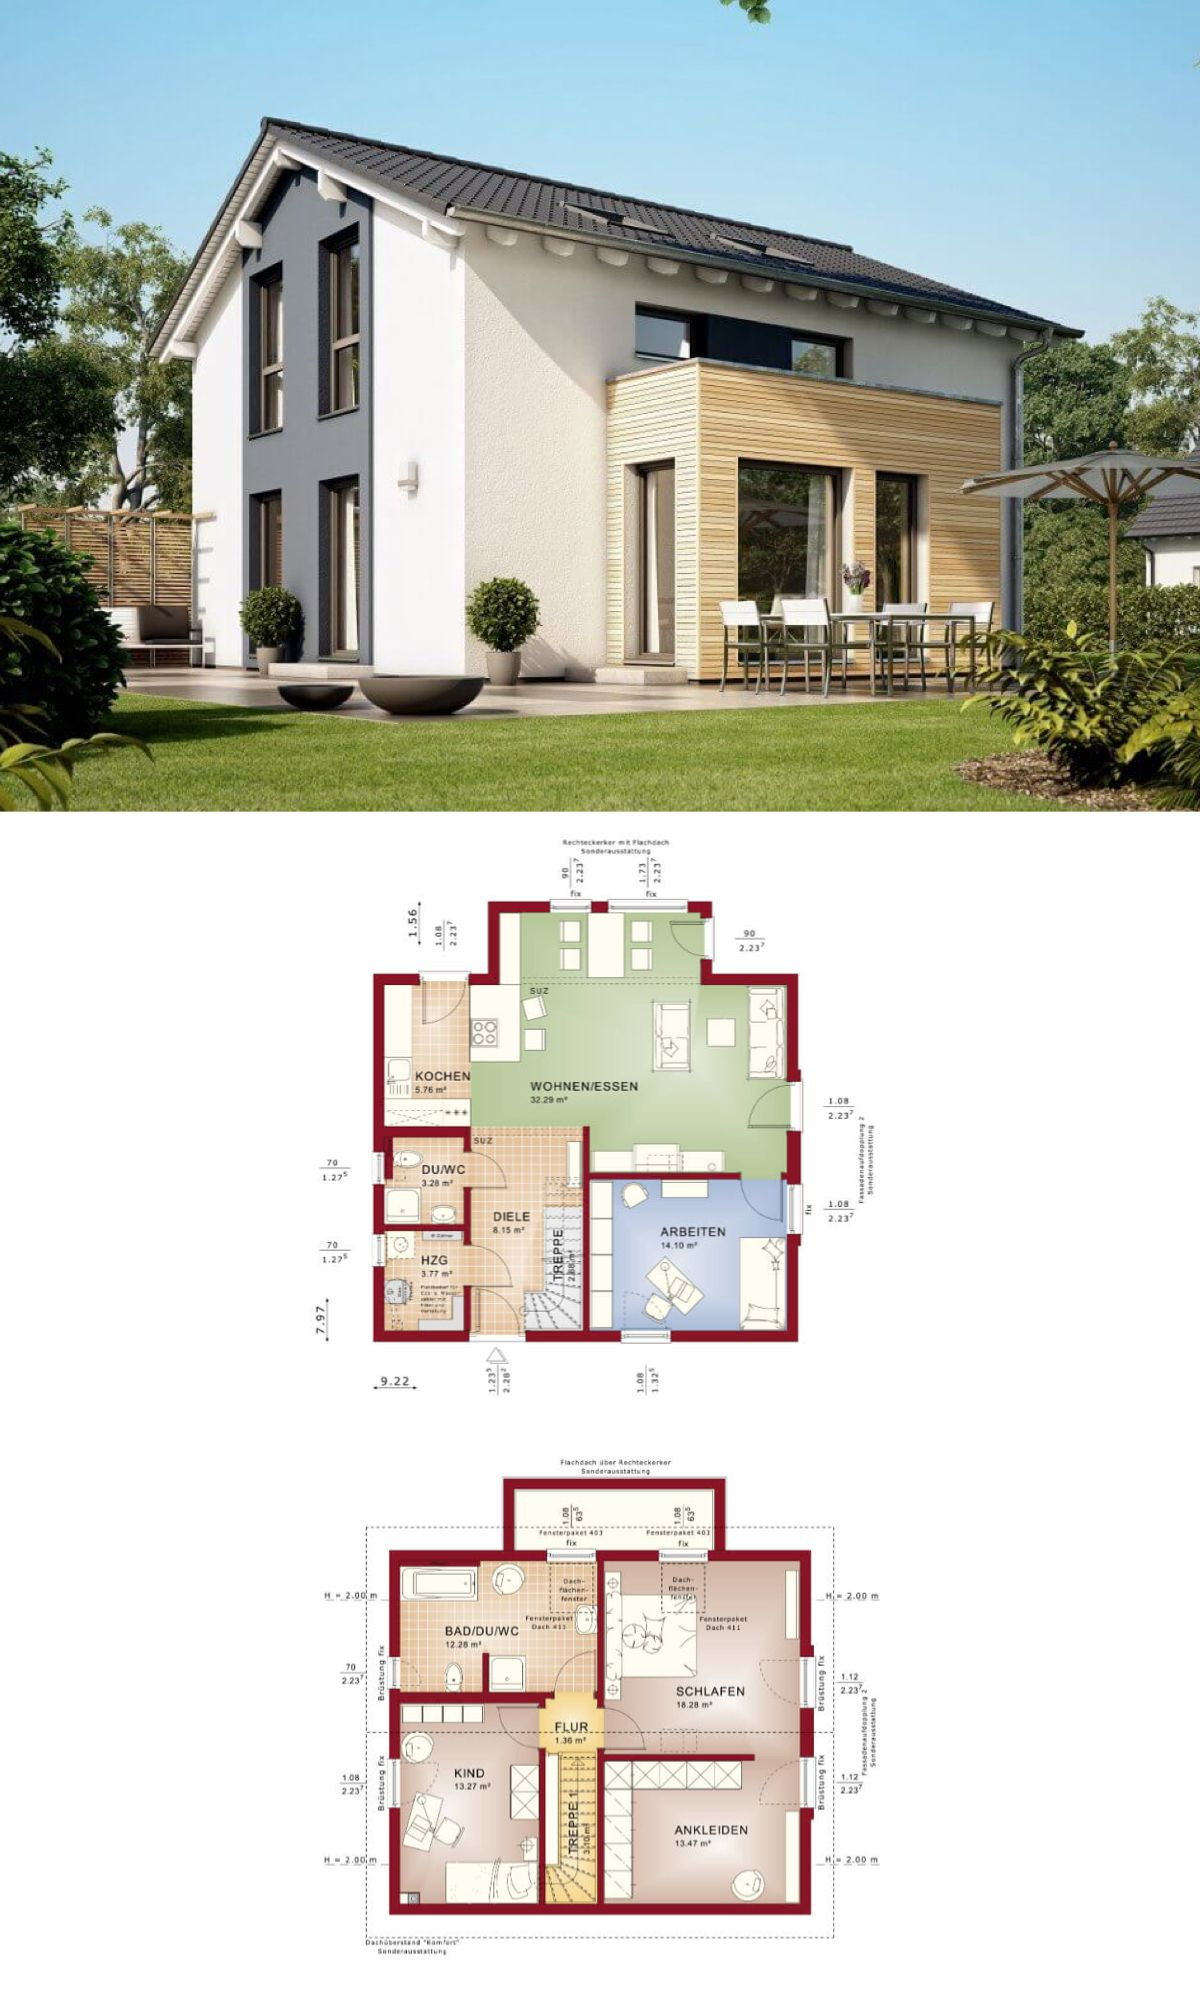 modernes einfamilienhaus haus solution 124 v6 living haus fertighaus bauen grundriss 5 zimmer - Fertighausplne